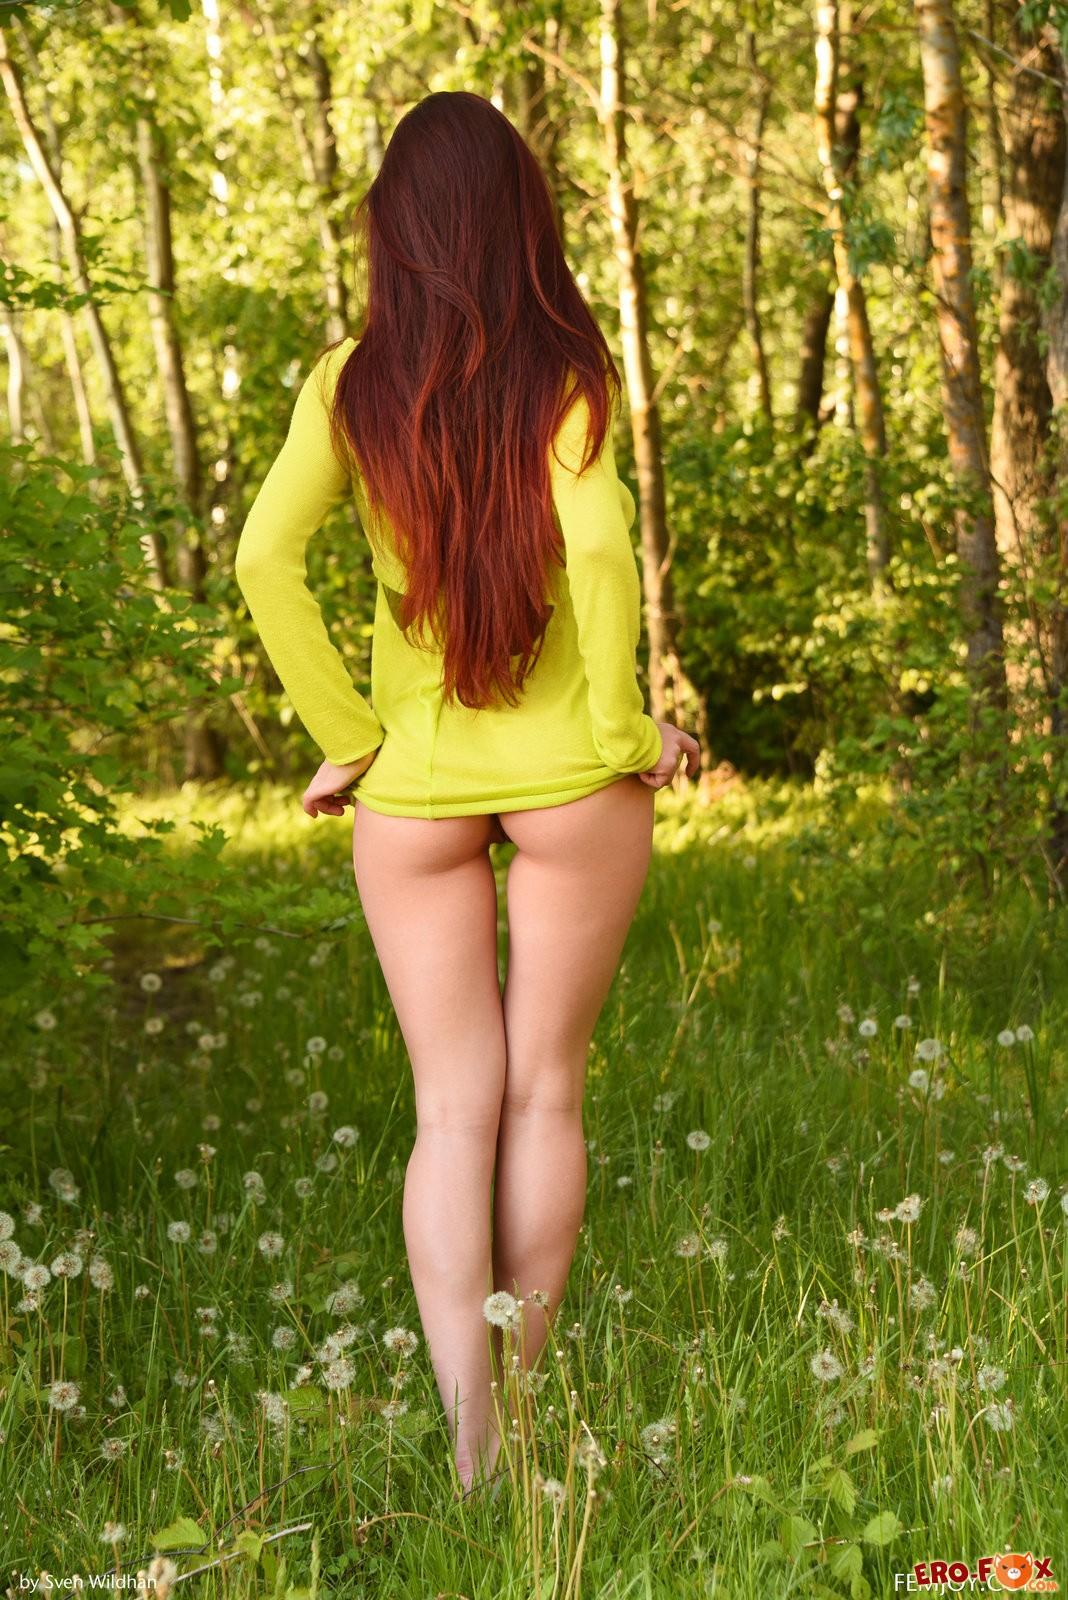 Голая на поляне, рыженькая красотка в лесу .